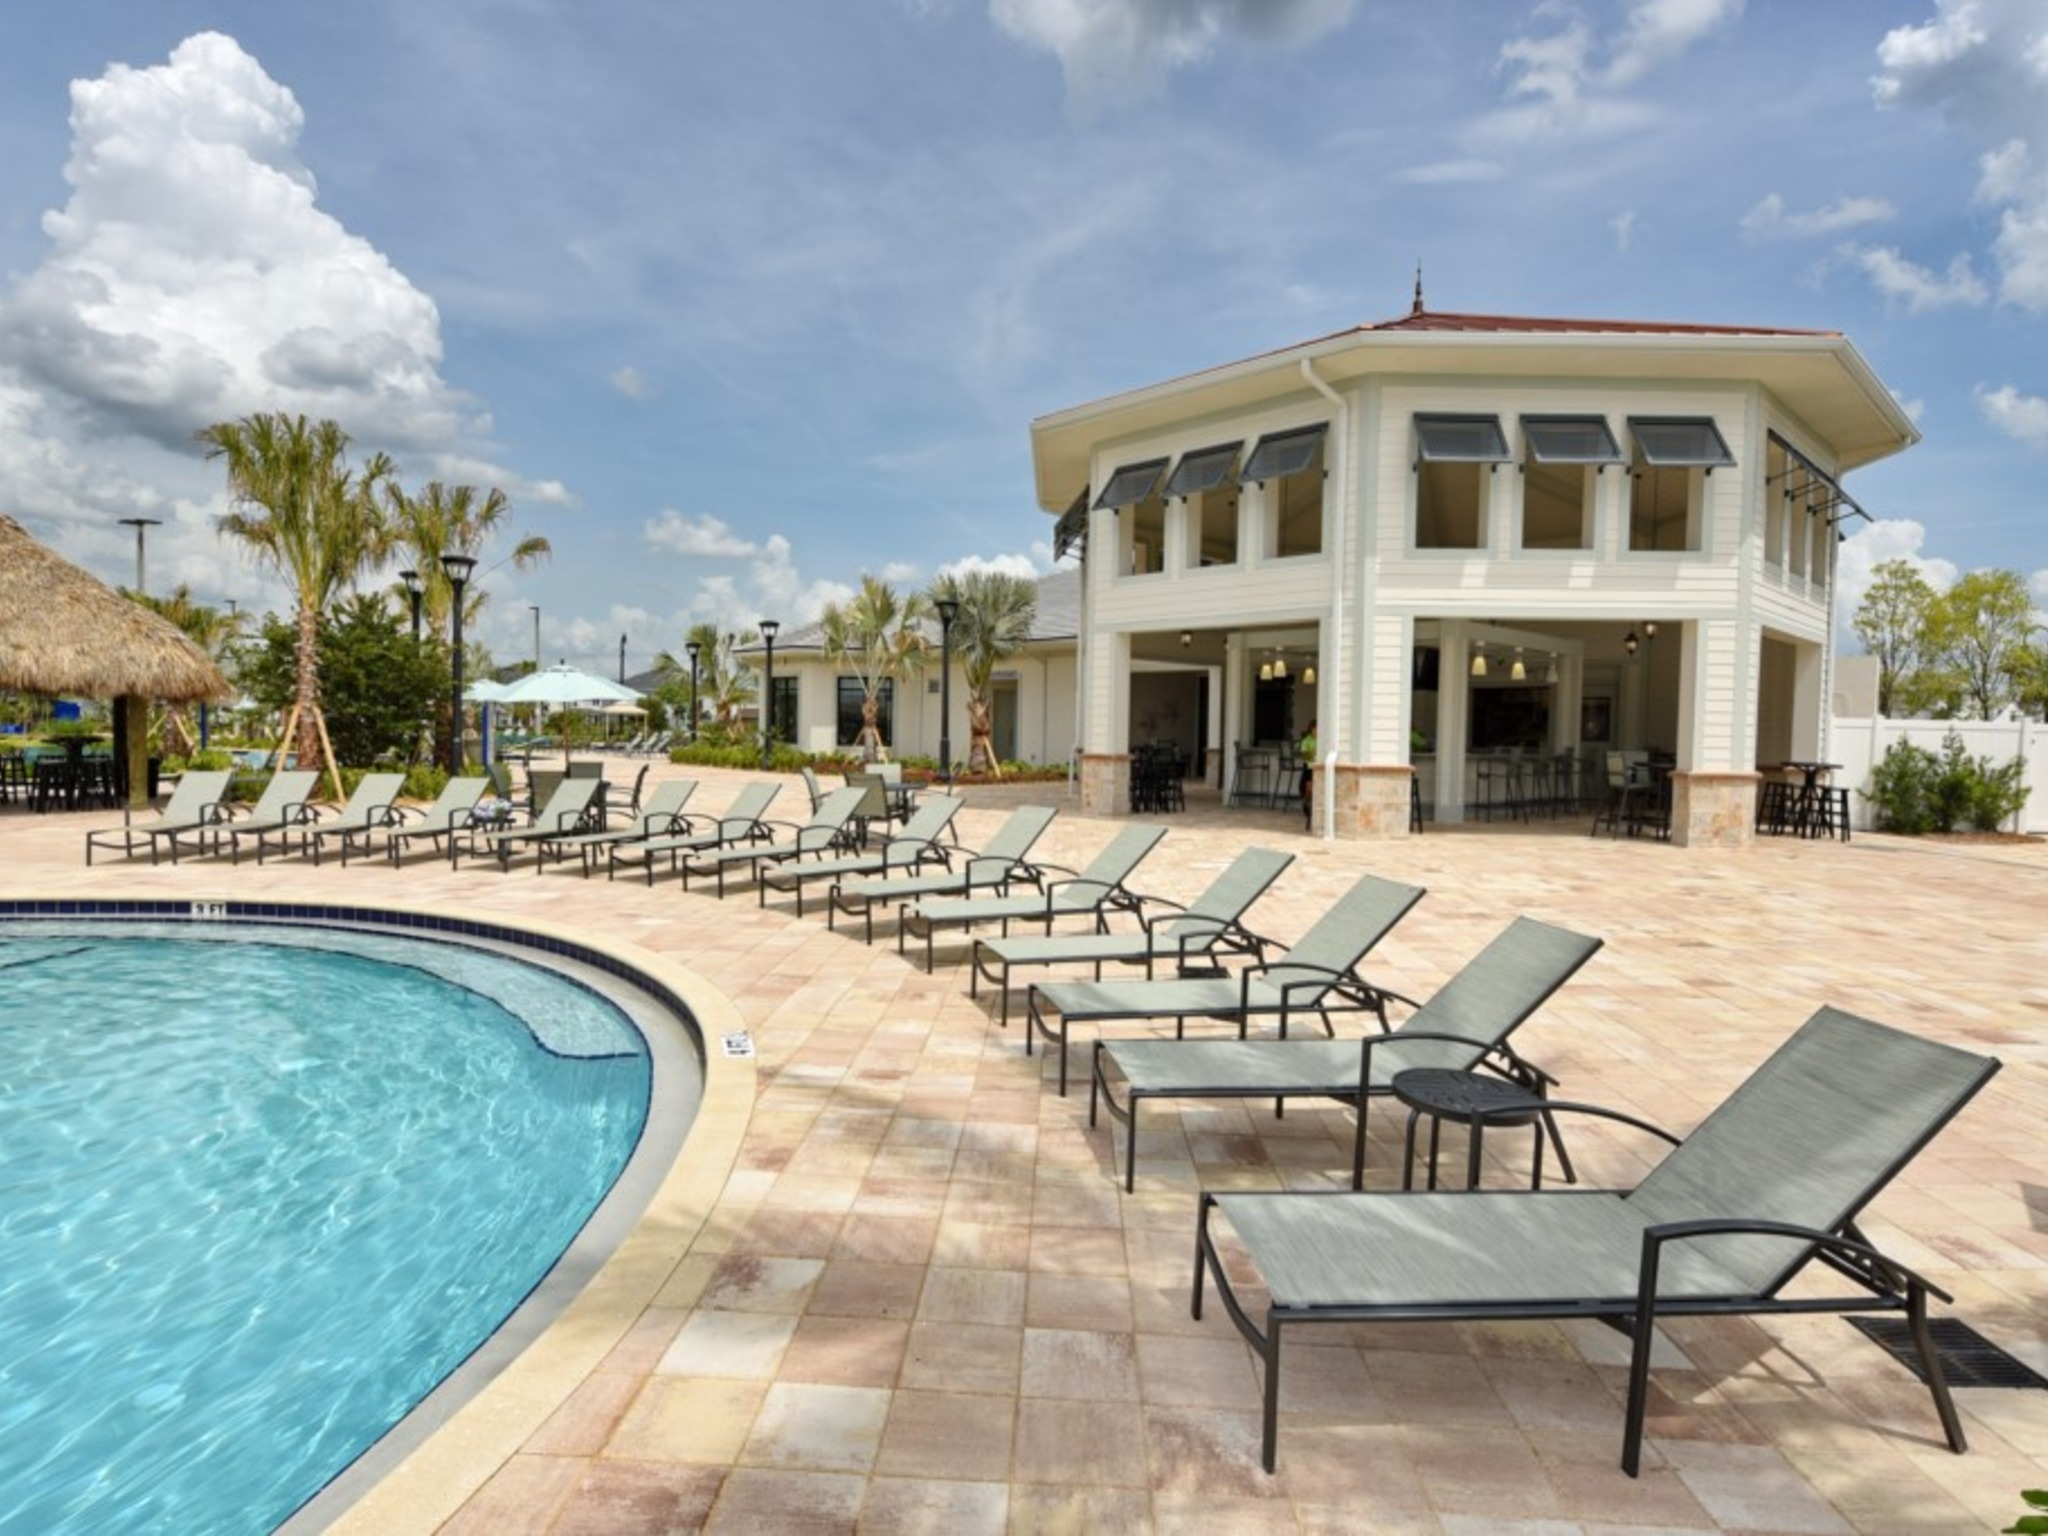 4 bedroom villa accommodates 10 guests kissimmee fl - 10 bedroom vacation rentals orlando florida ...